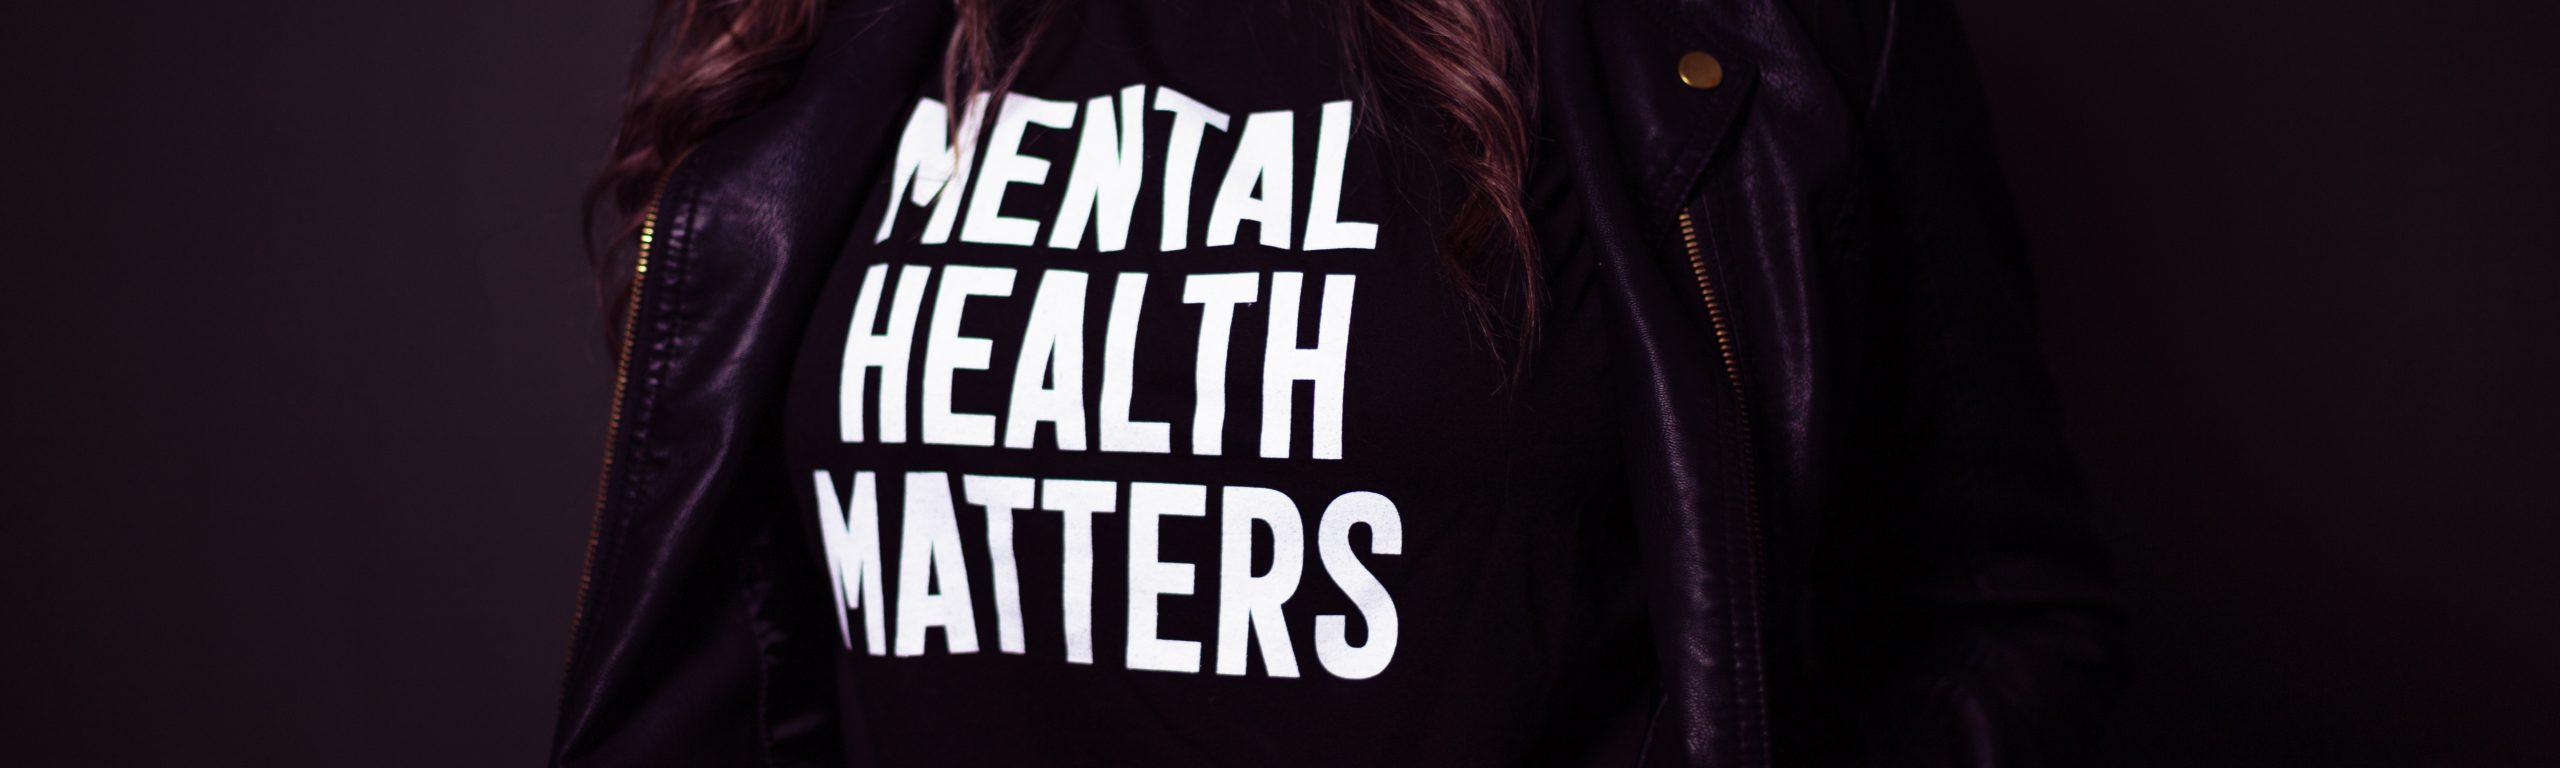 mental health matters banner